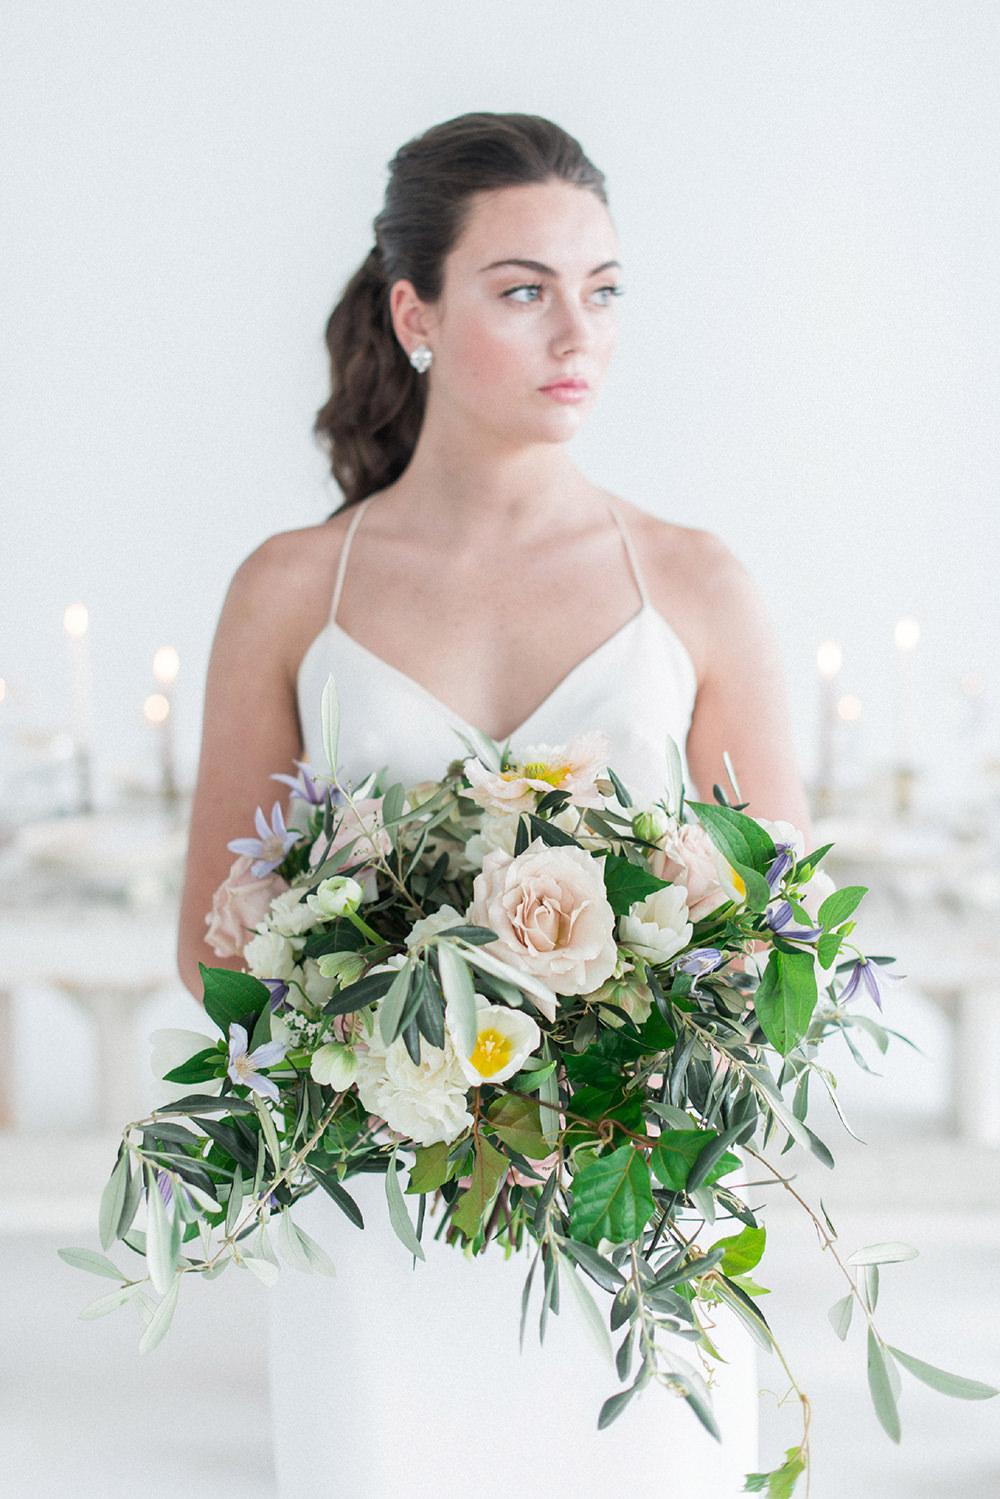 garden wedding flowers - photo by Laura Kelly Photography https://ruffledblog.com/minimalist-monochrome-european-wedding-inspiration